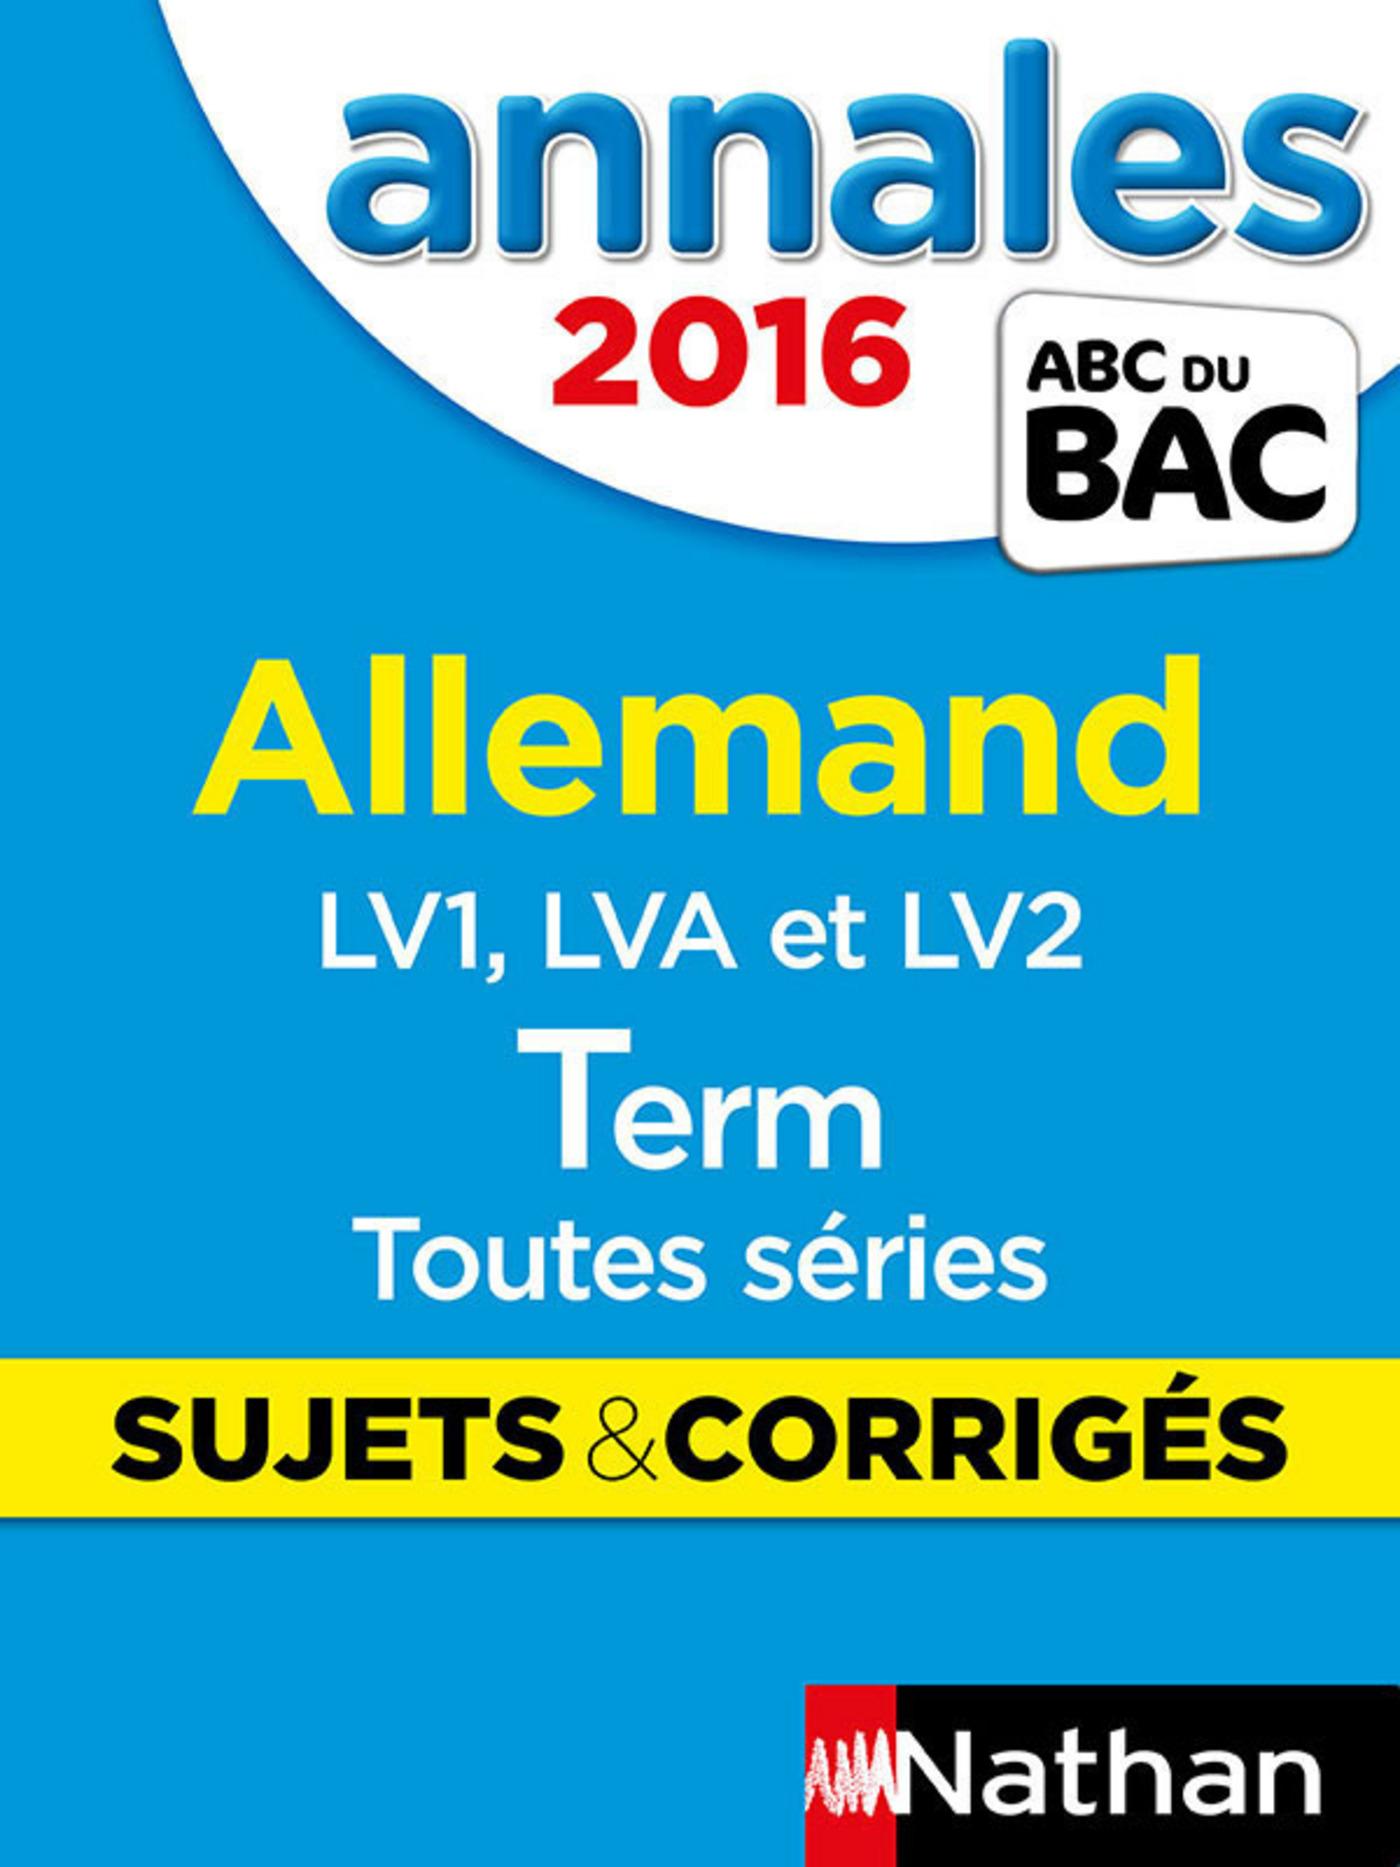 ANNALES BAC 2016 ALLEMAND TERM TOUTES SERIES SUJETS & CORRIGES N15